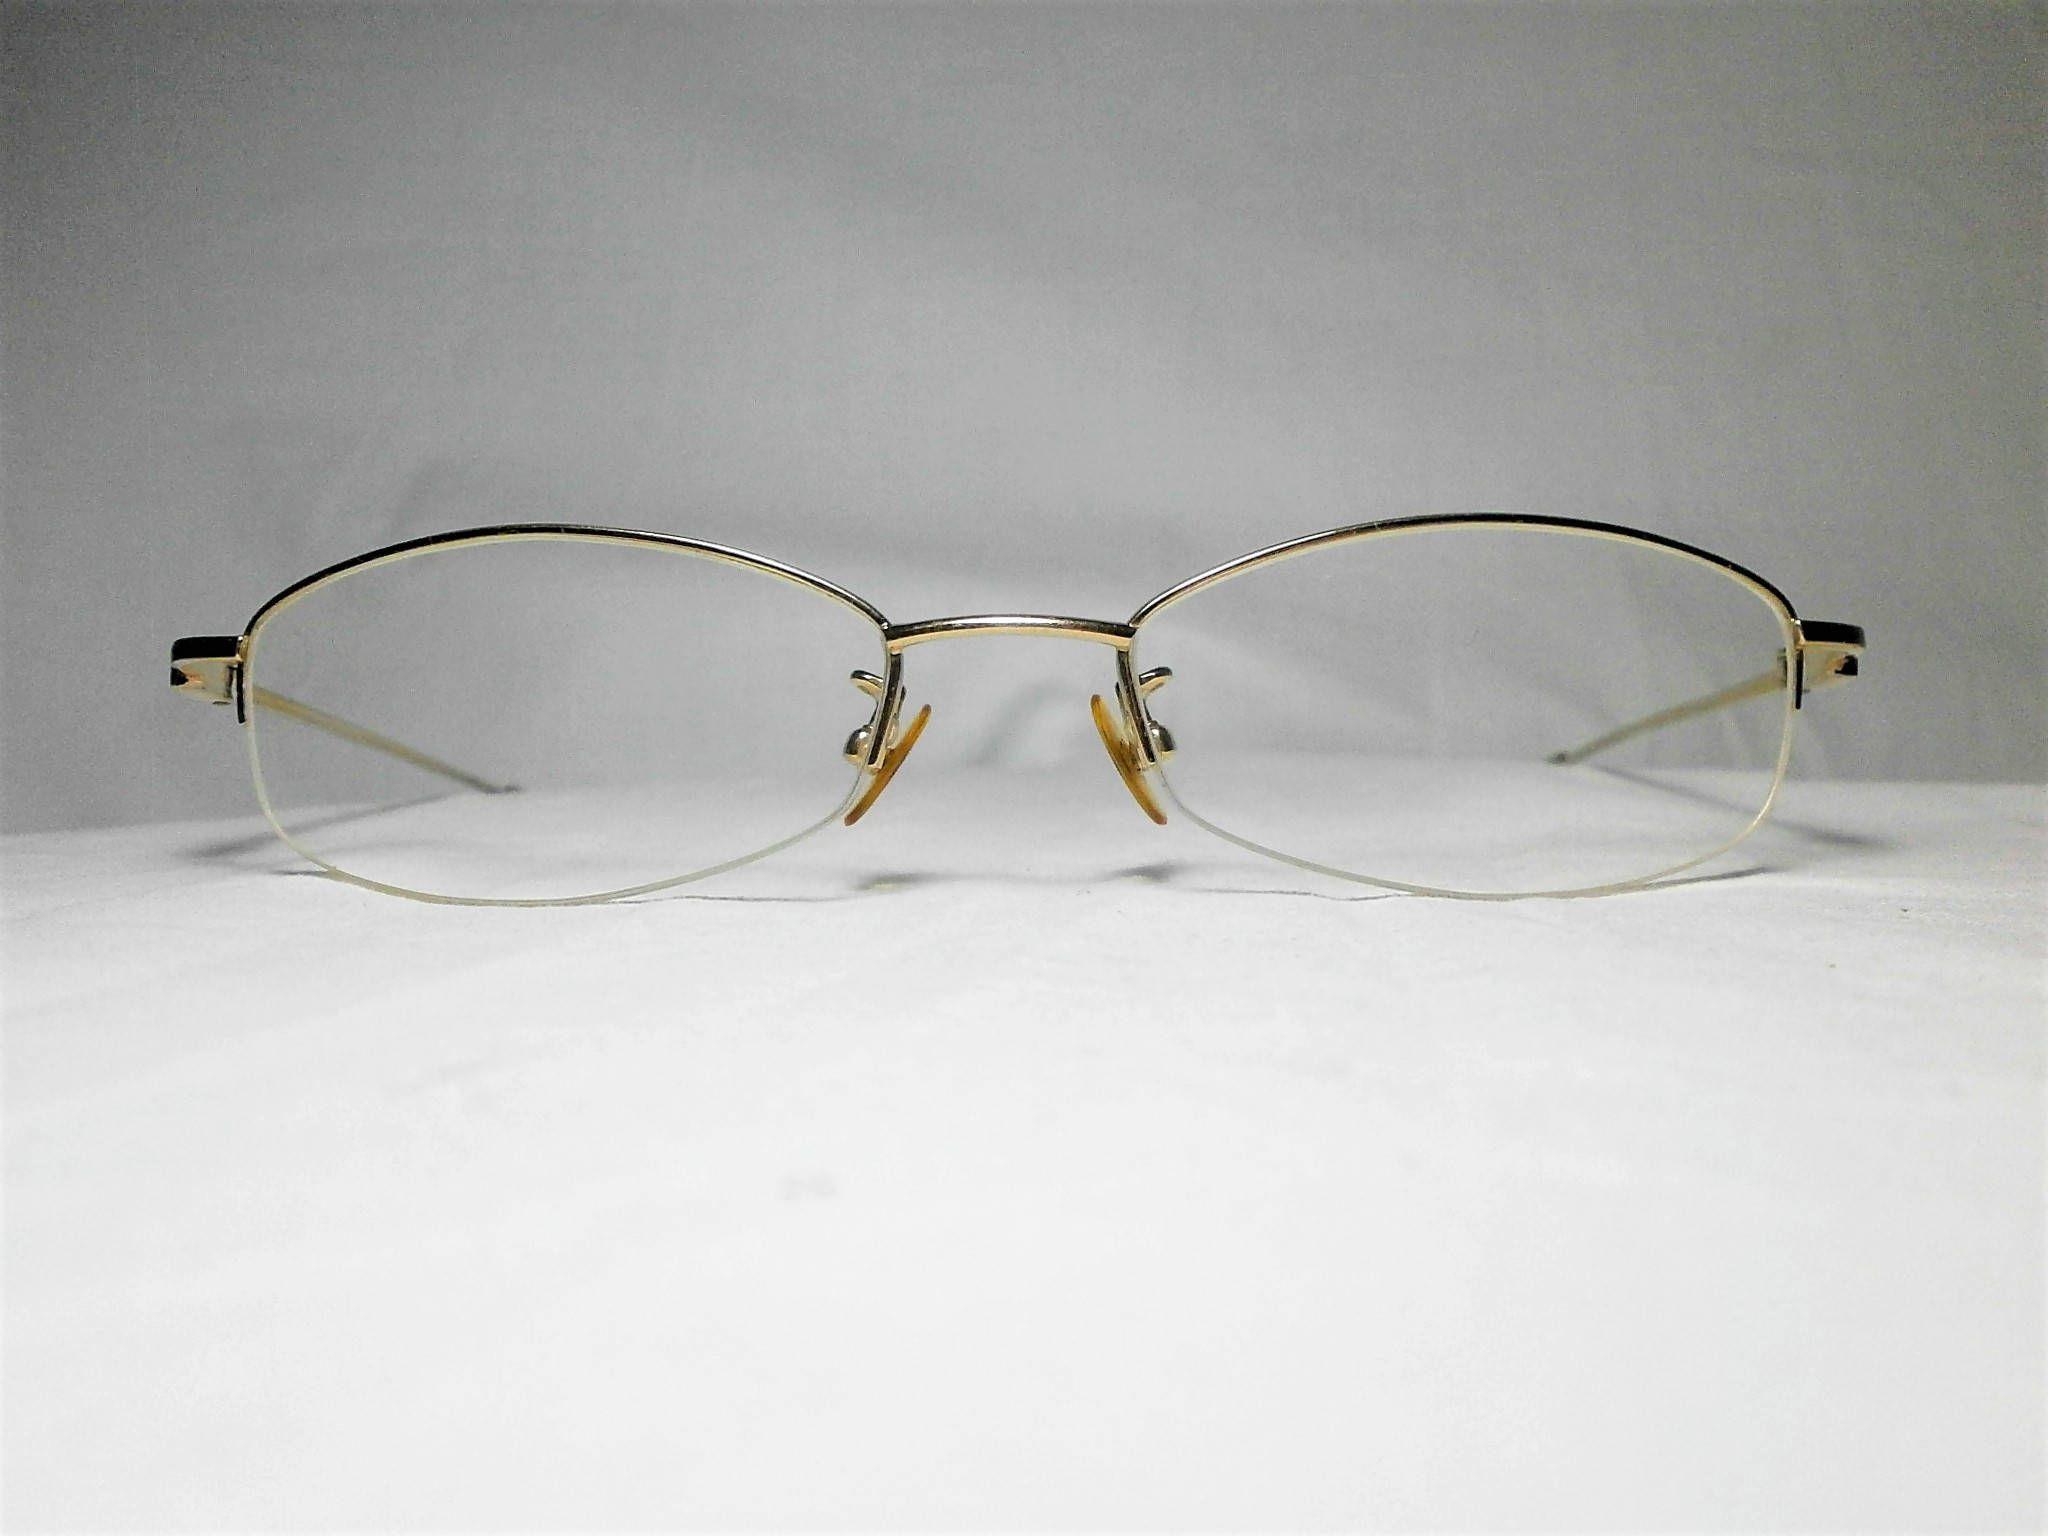 rare Silhouette oval WayFarer women/'s sunglasses super vintage NOS Gold plated Titanium men/'s rimless square